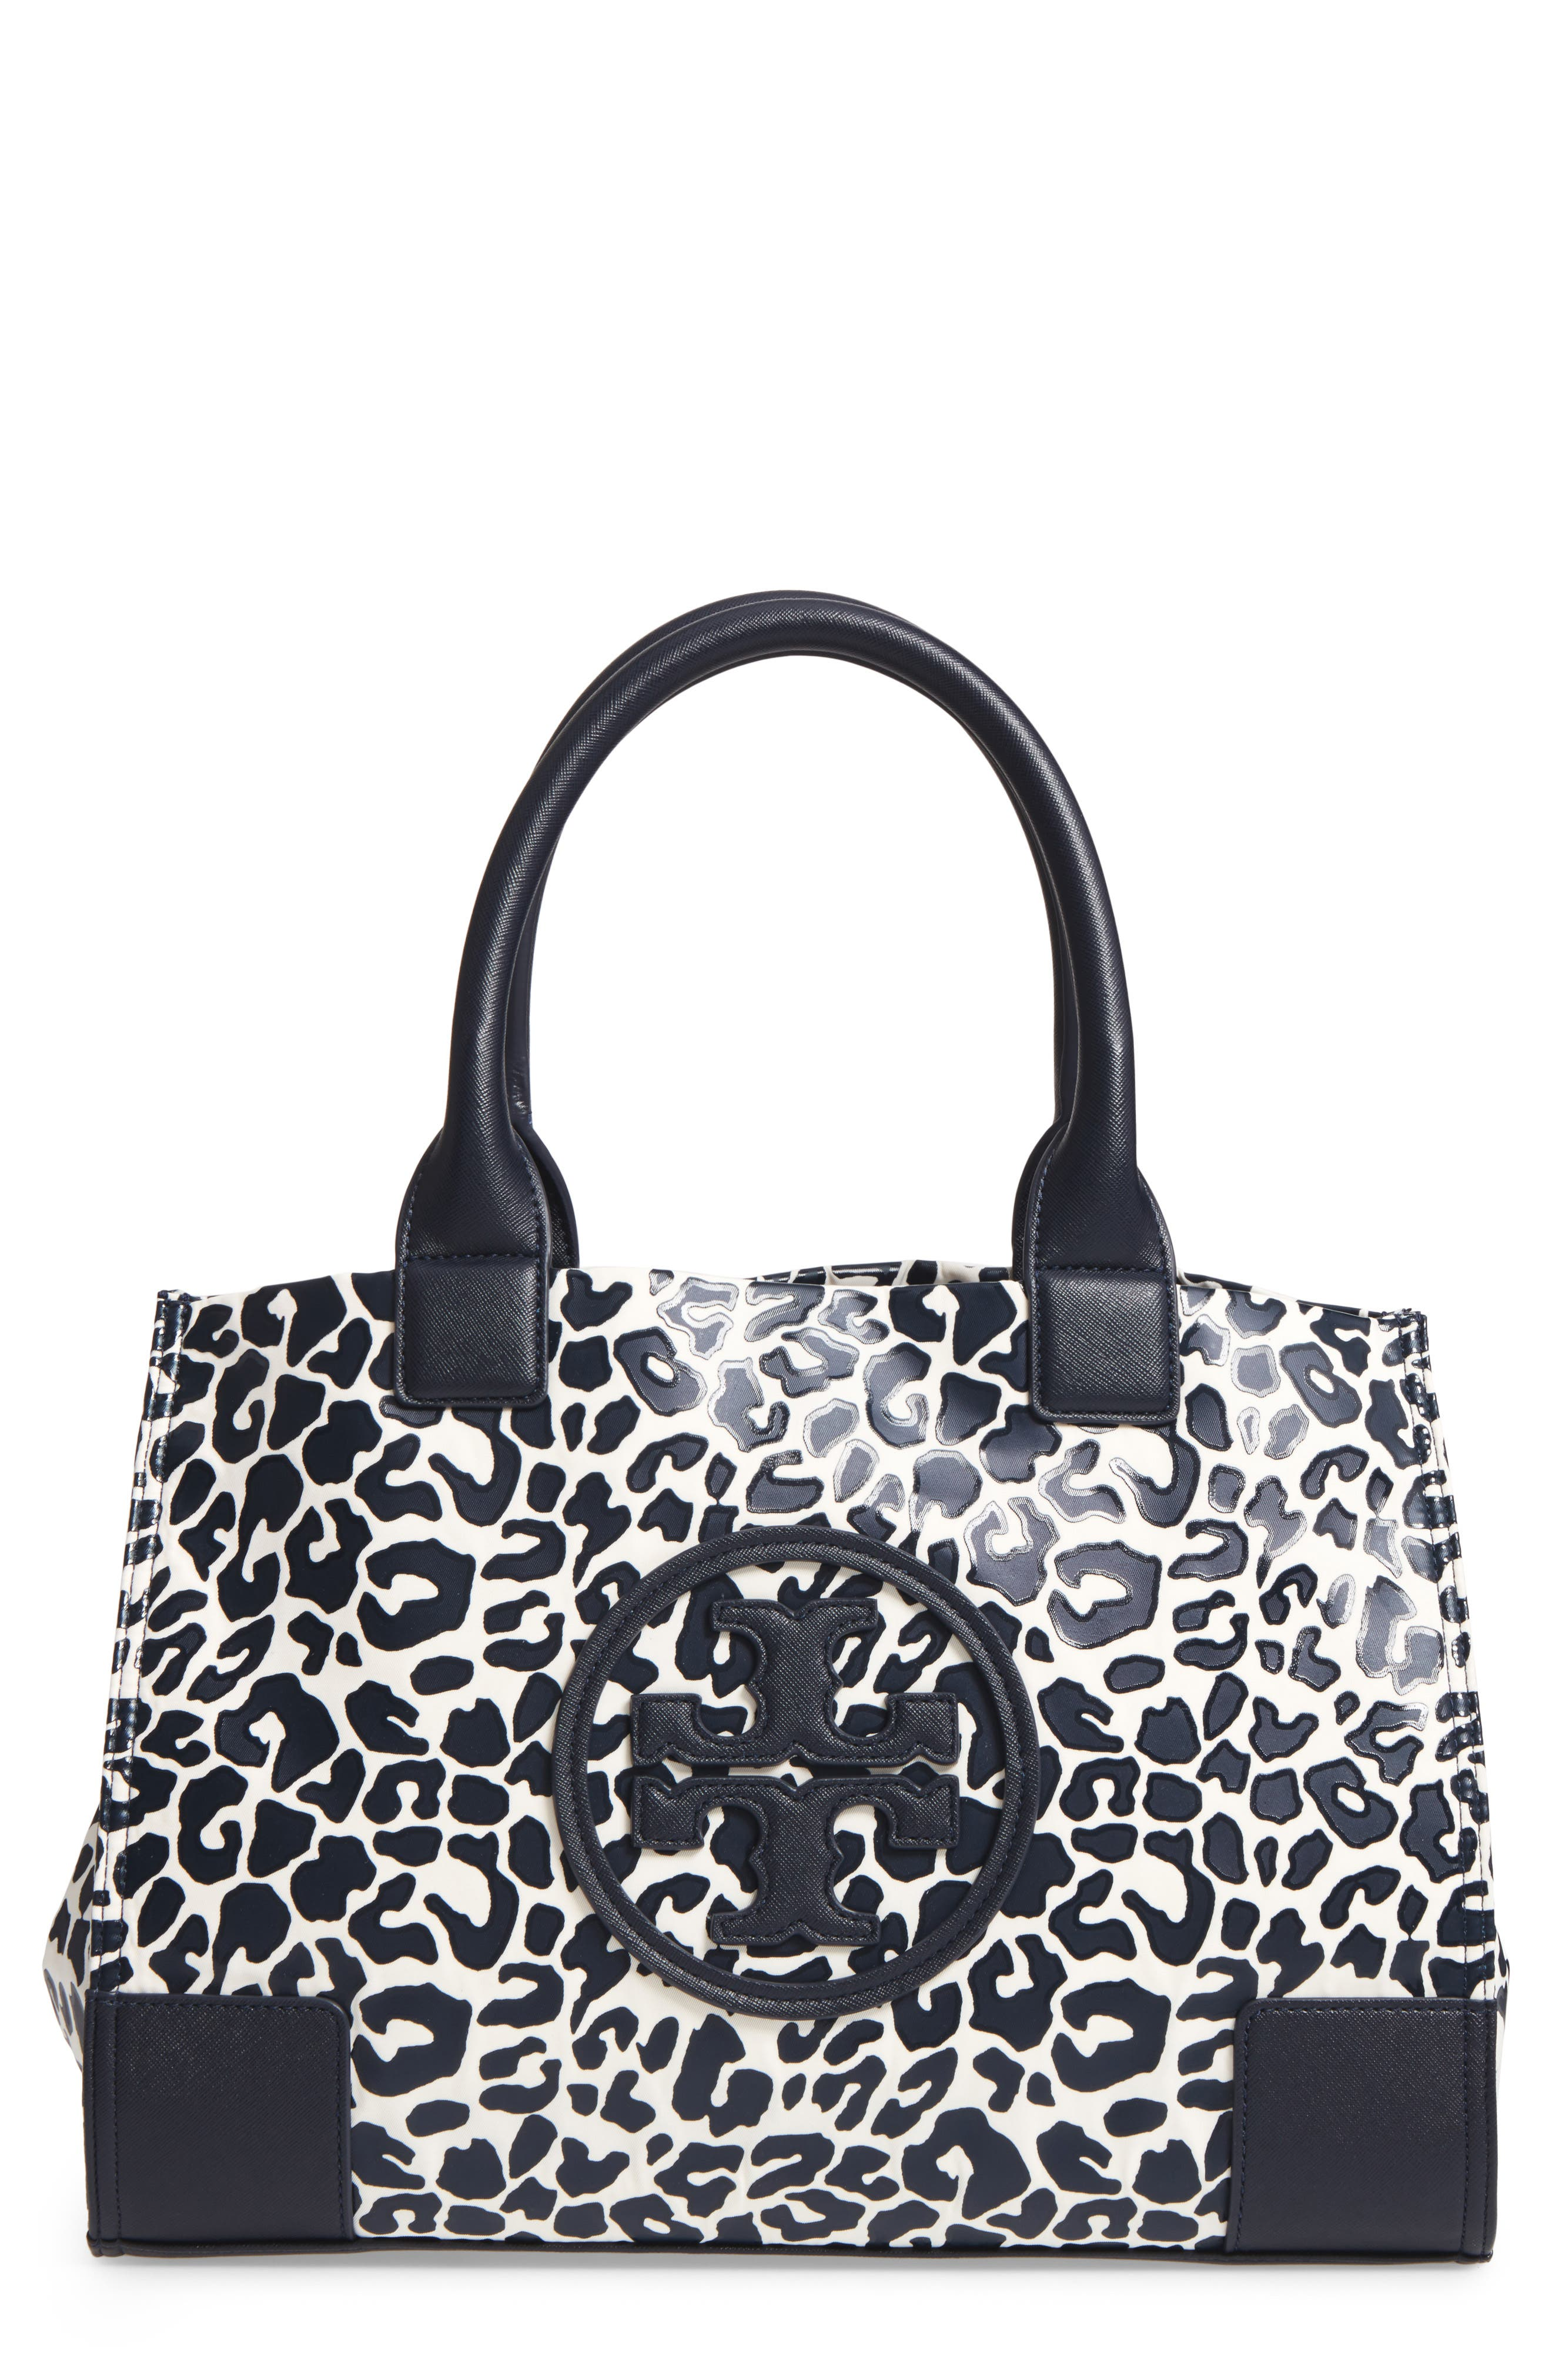 Tory Burch Mini Ella Leopard Print Nylon Tote